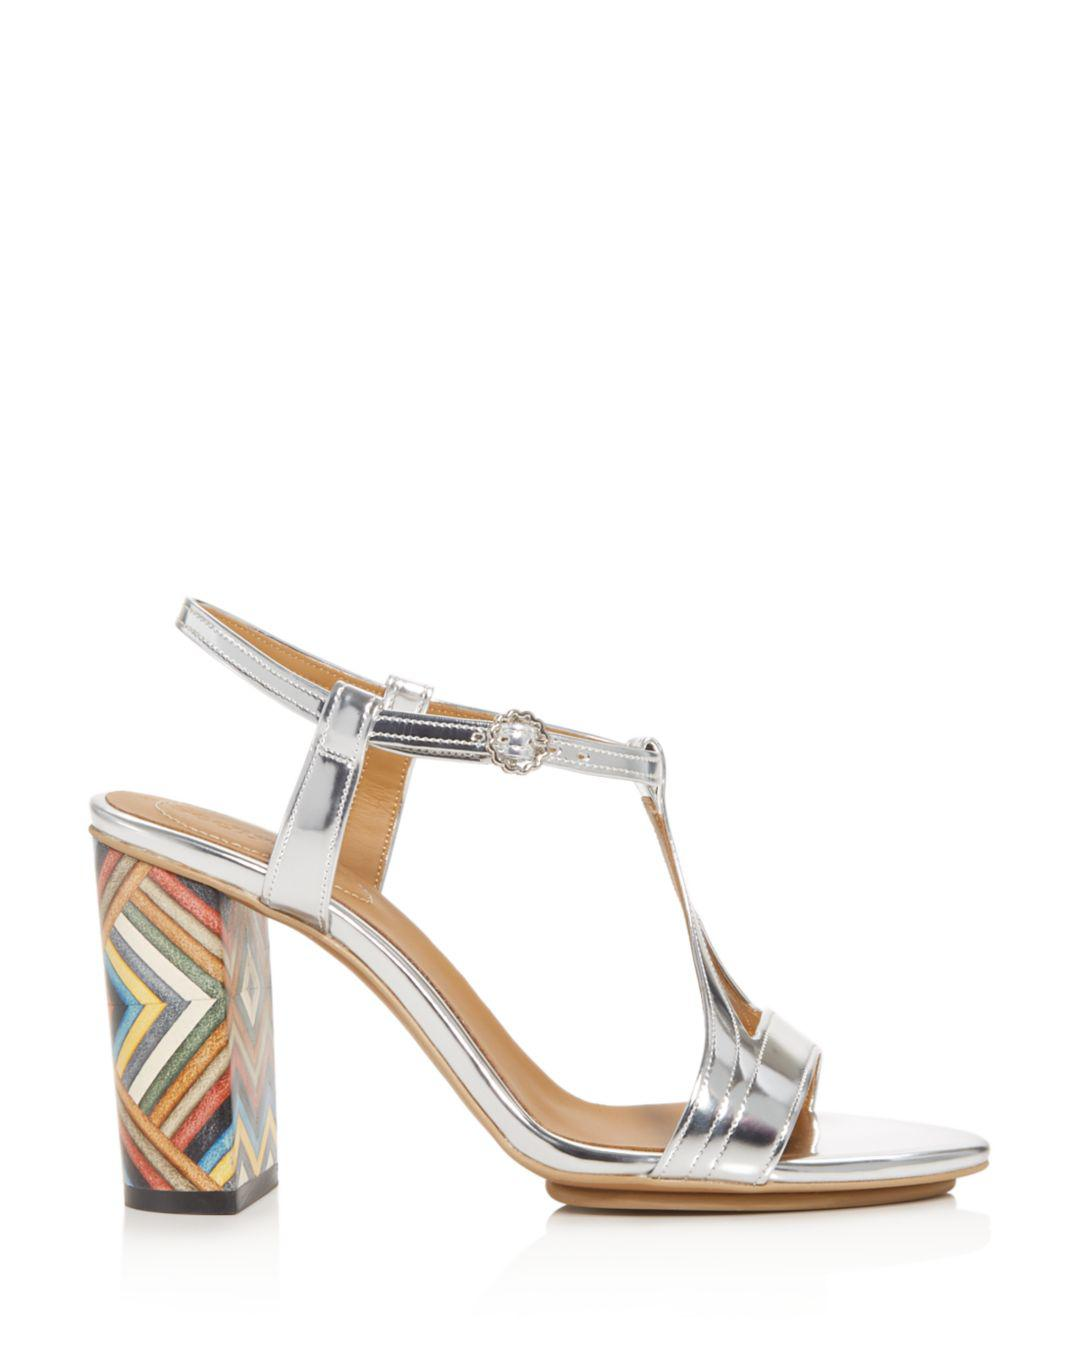 bbd41e5410f See By Chloé Women s Isida High Block-heel Sandals in Metallic - Lyst